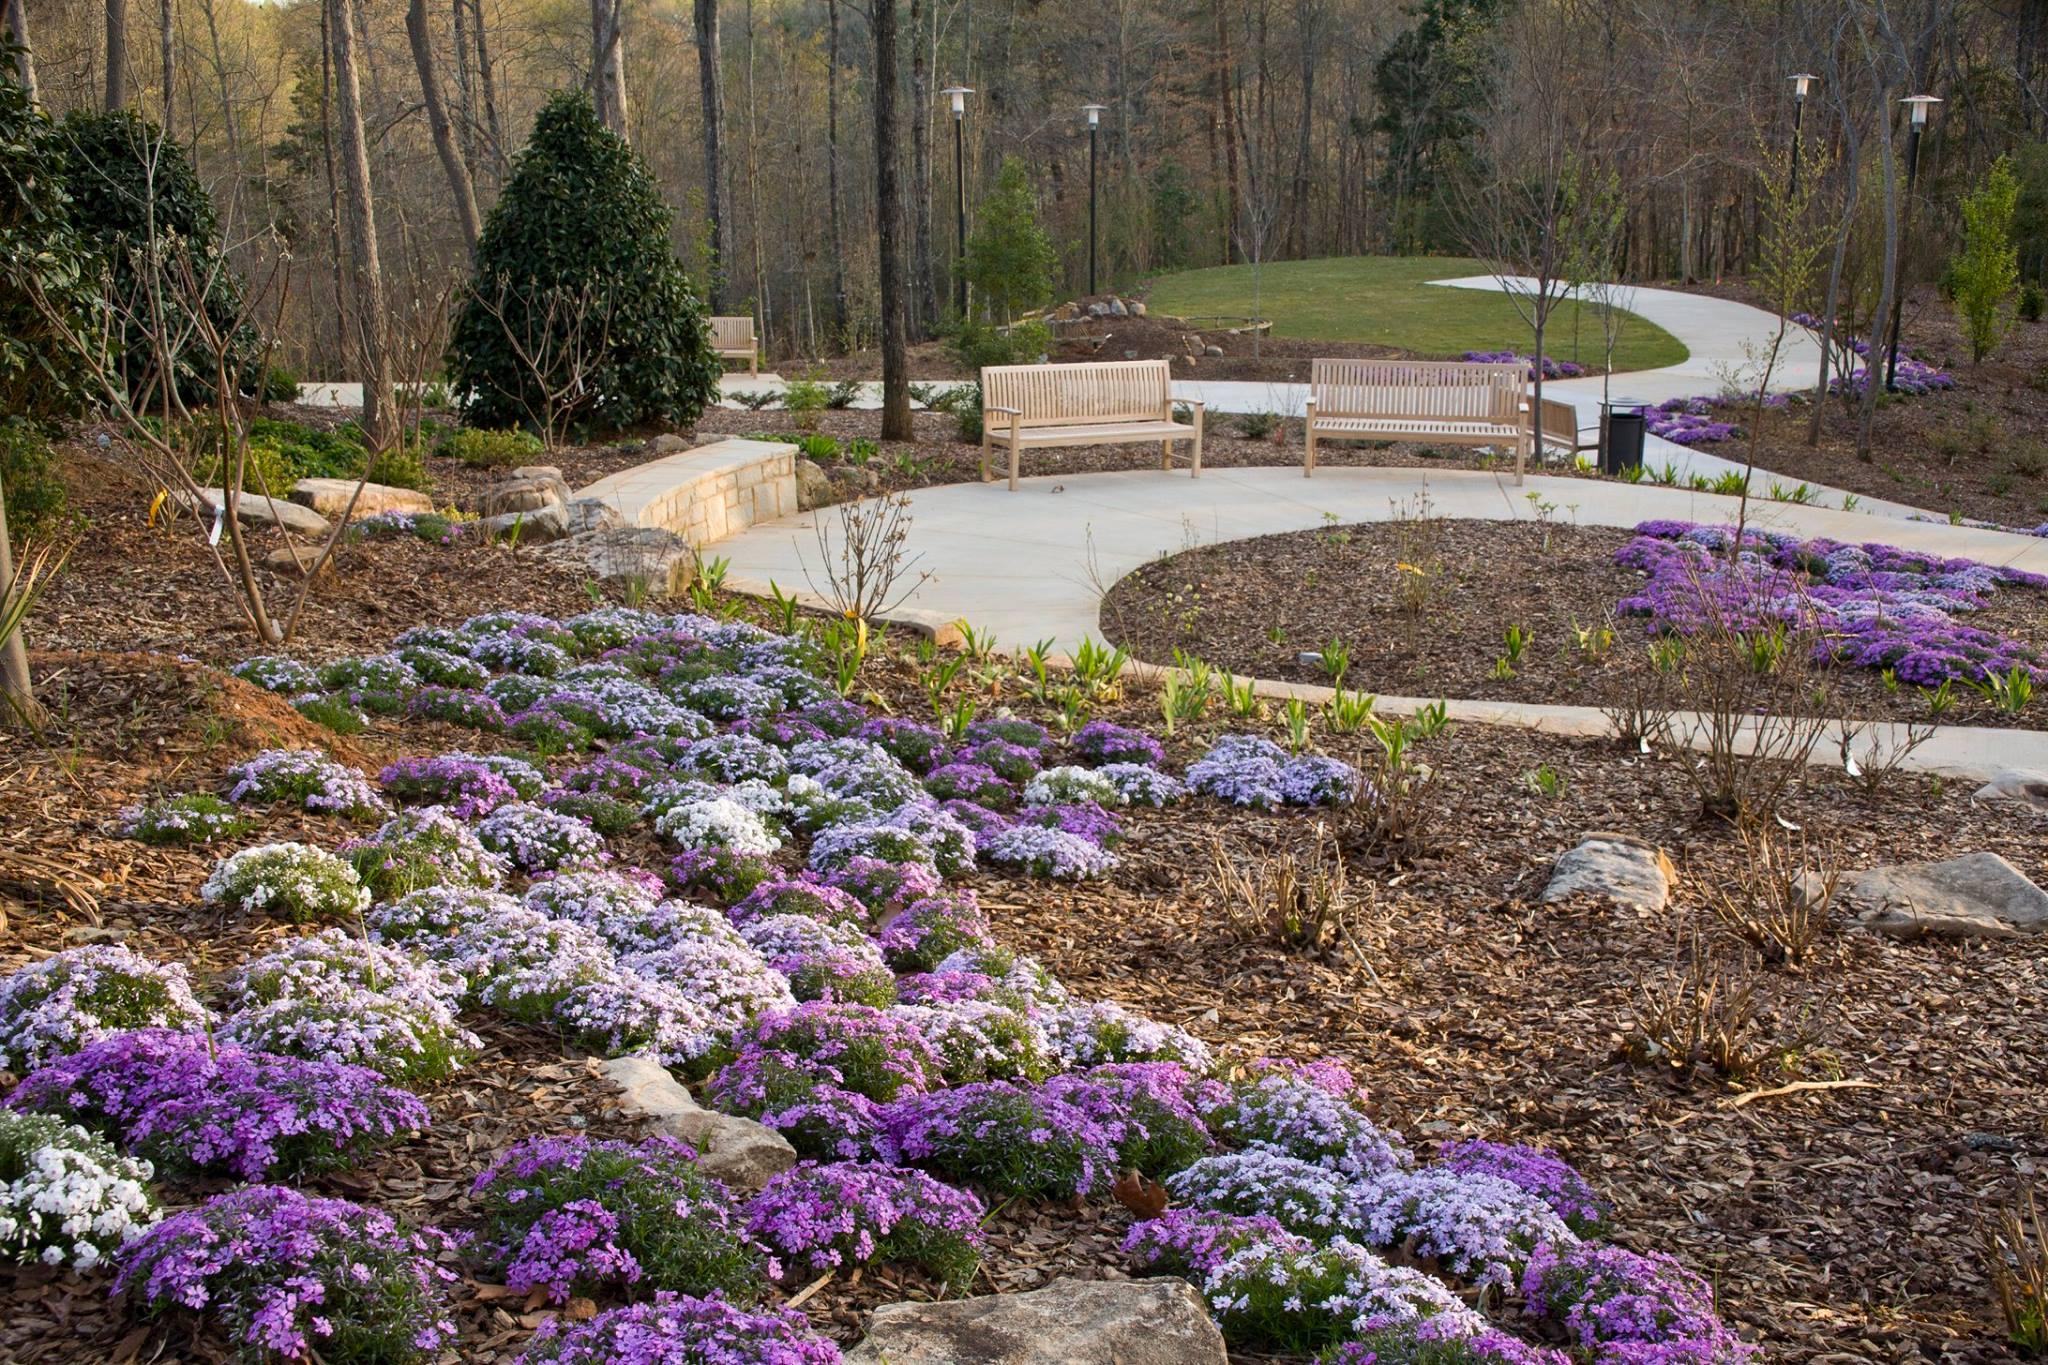 Http://atlantabg.org/content/1 Visit/3 Gainesville /gainesville_garden_map_2016_web.pdf